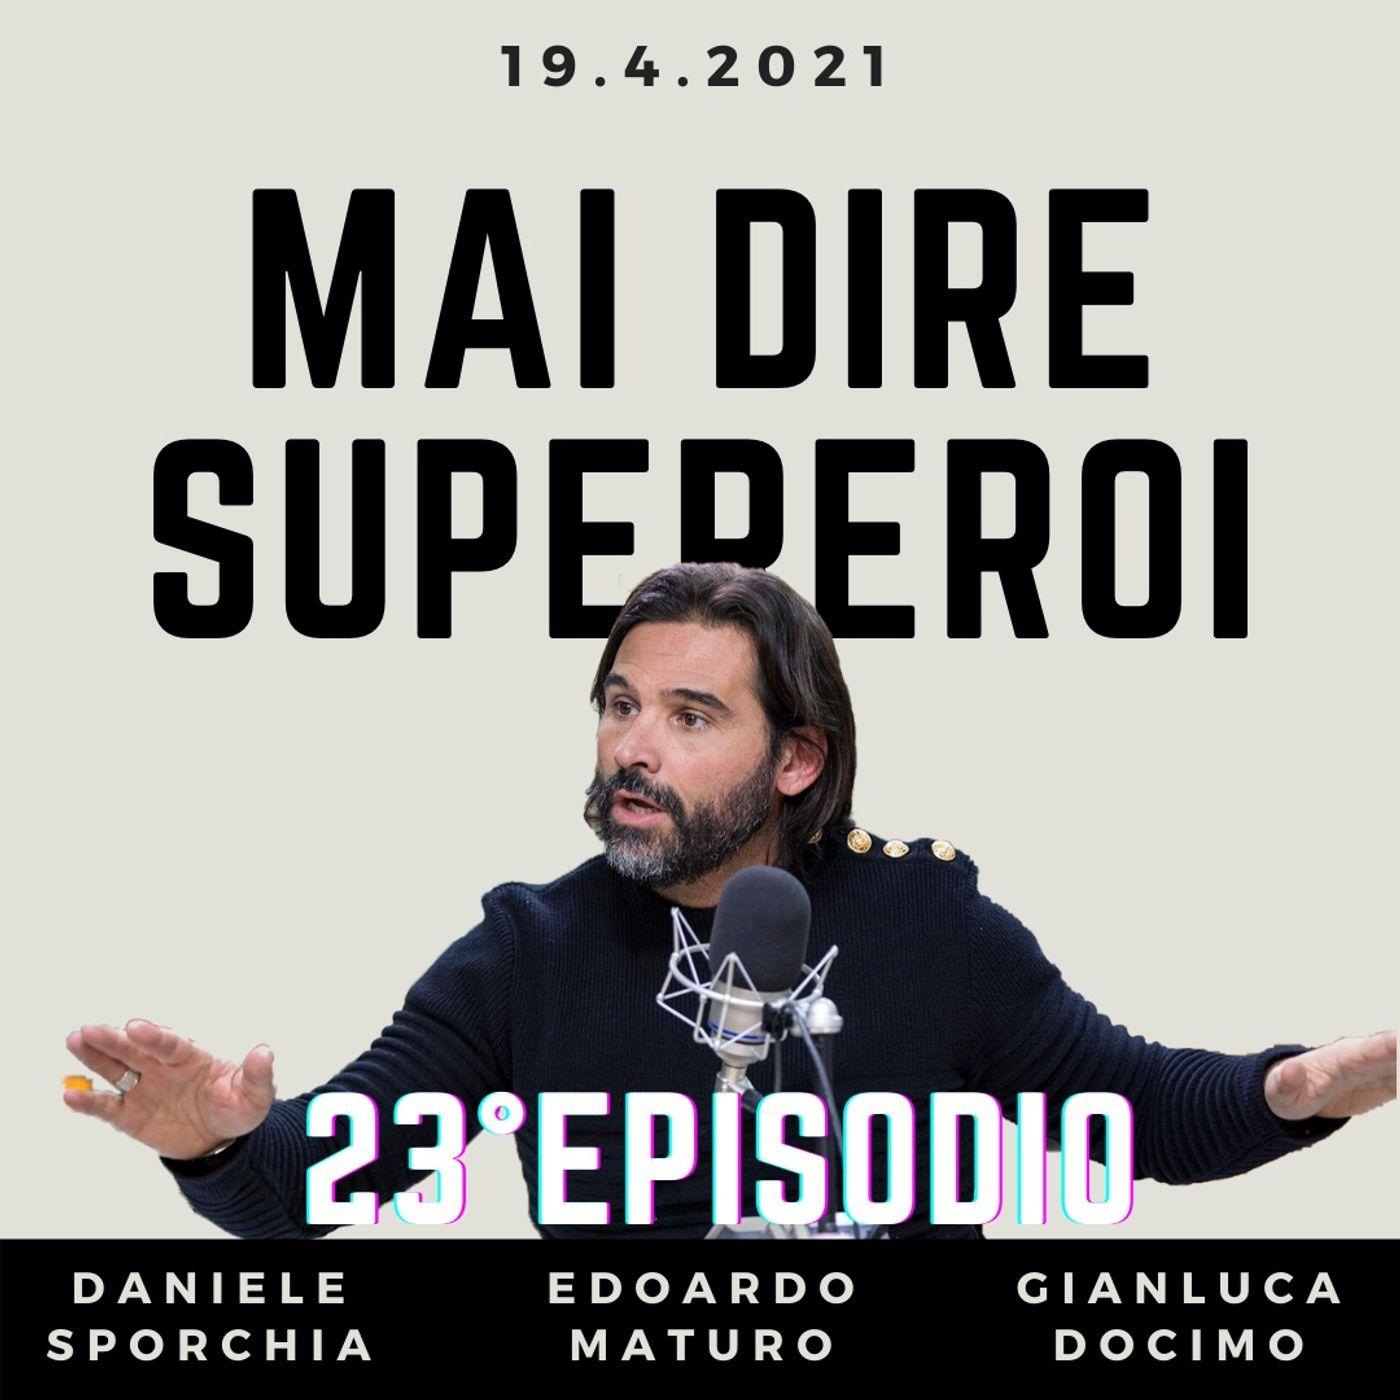 MAI DIRE SUPEREROI - 23° EPISODIO (SPECIALE #SUPERLEGA)